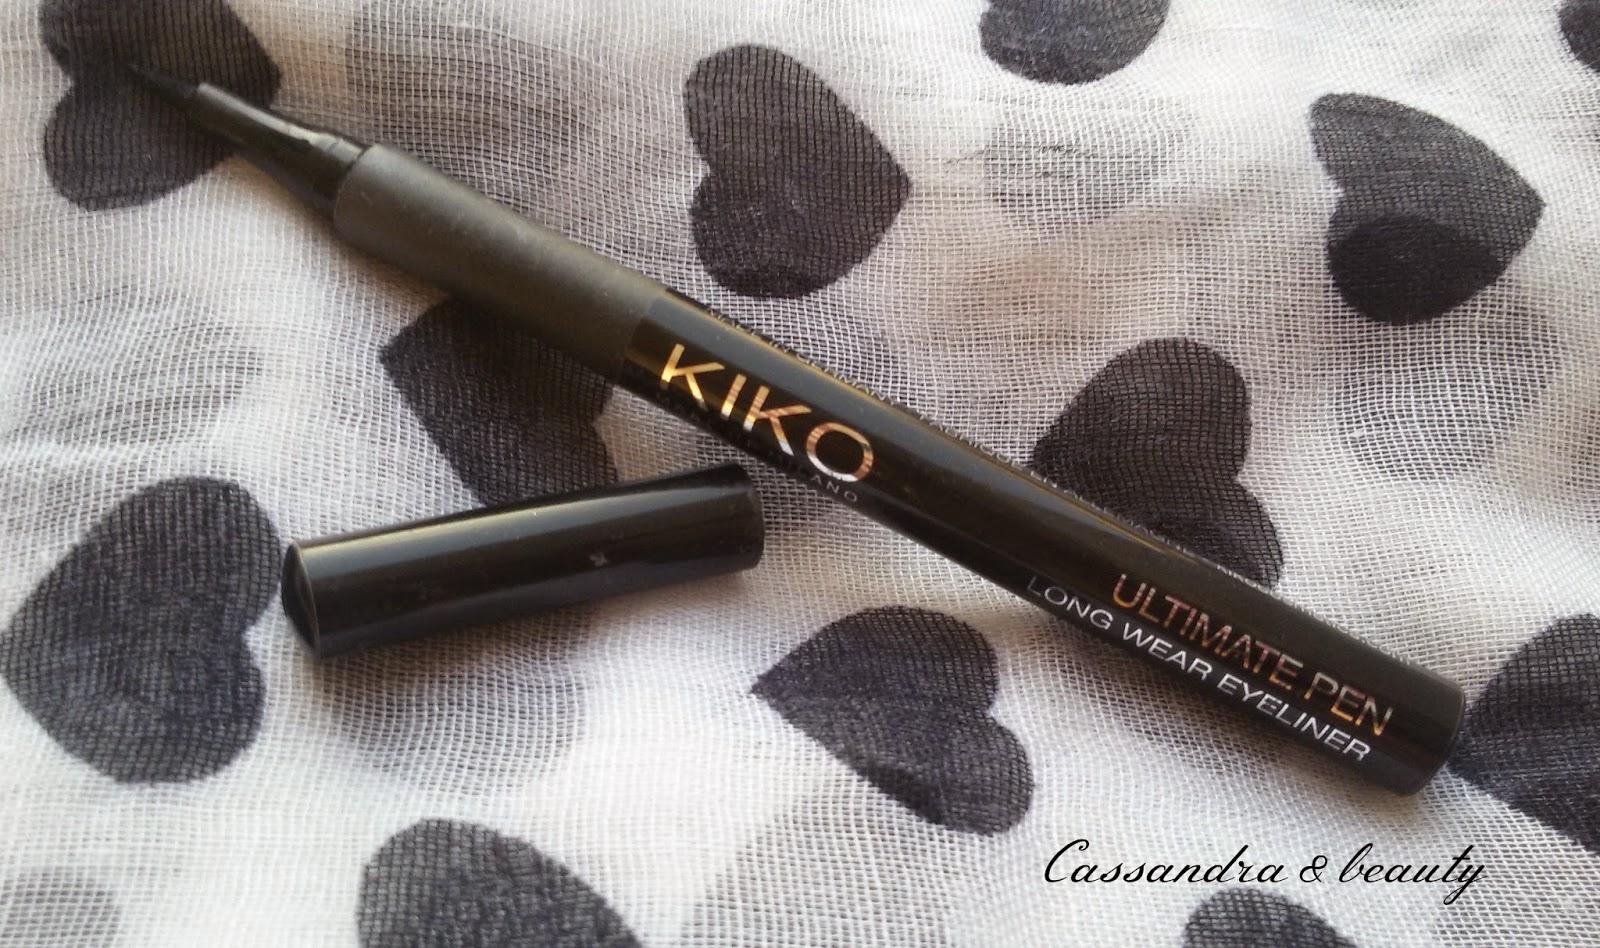 EYELINER KIKO: swatch e recensione del Precision eyeliner e dell'Ultimate Pen longwear eyeliner